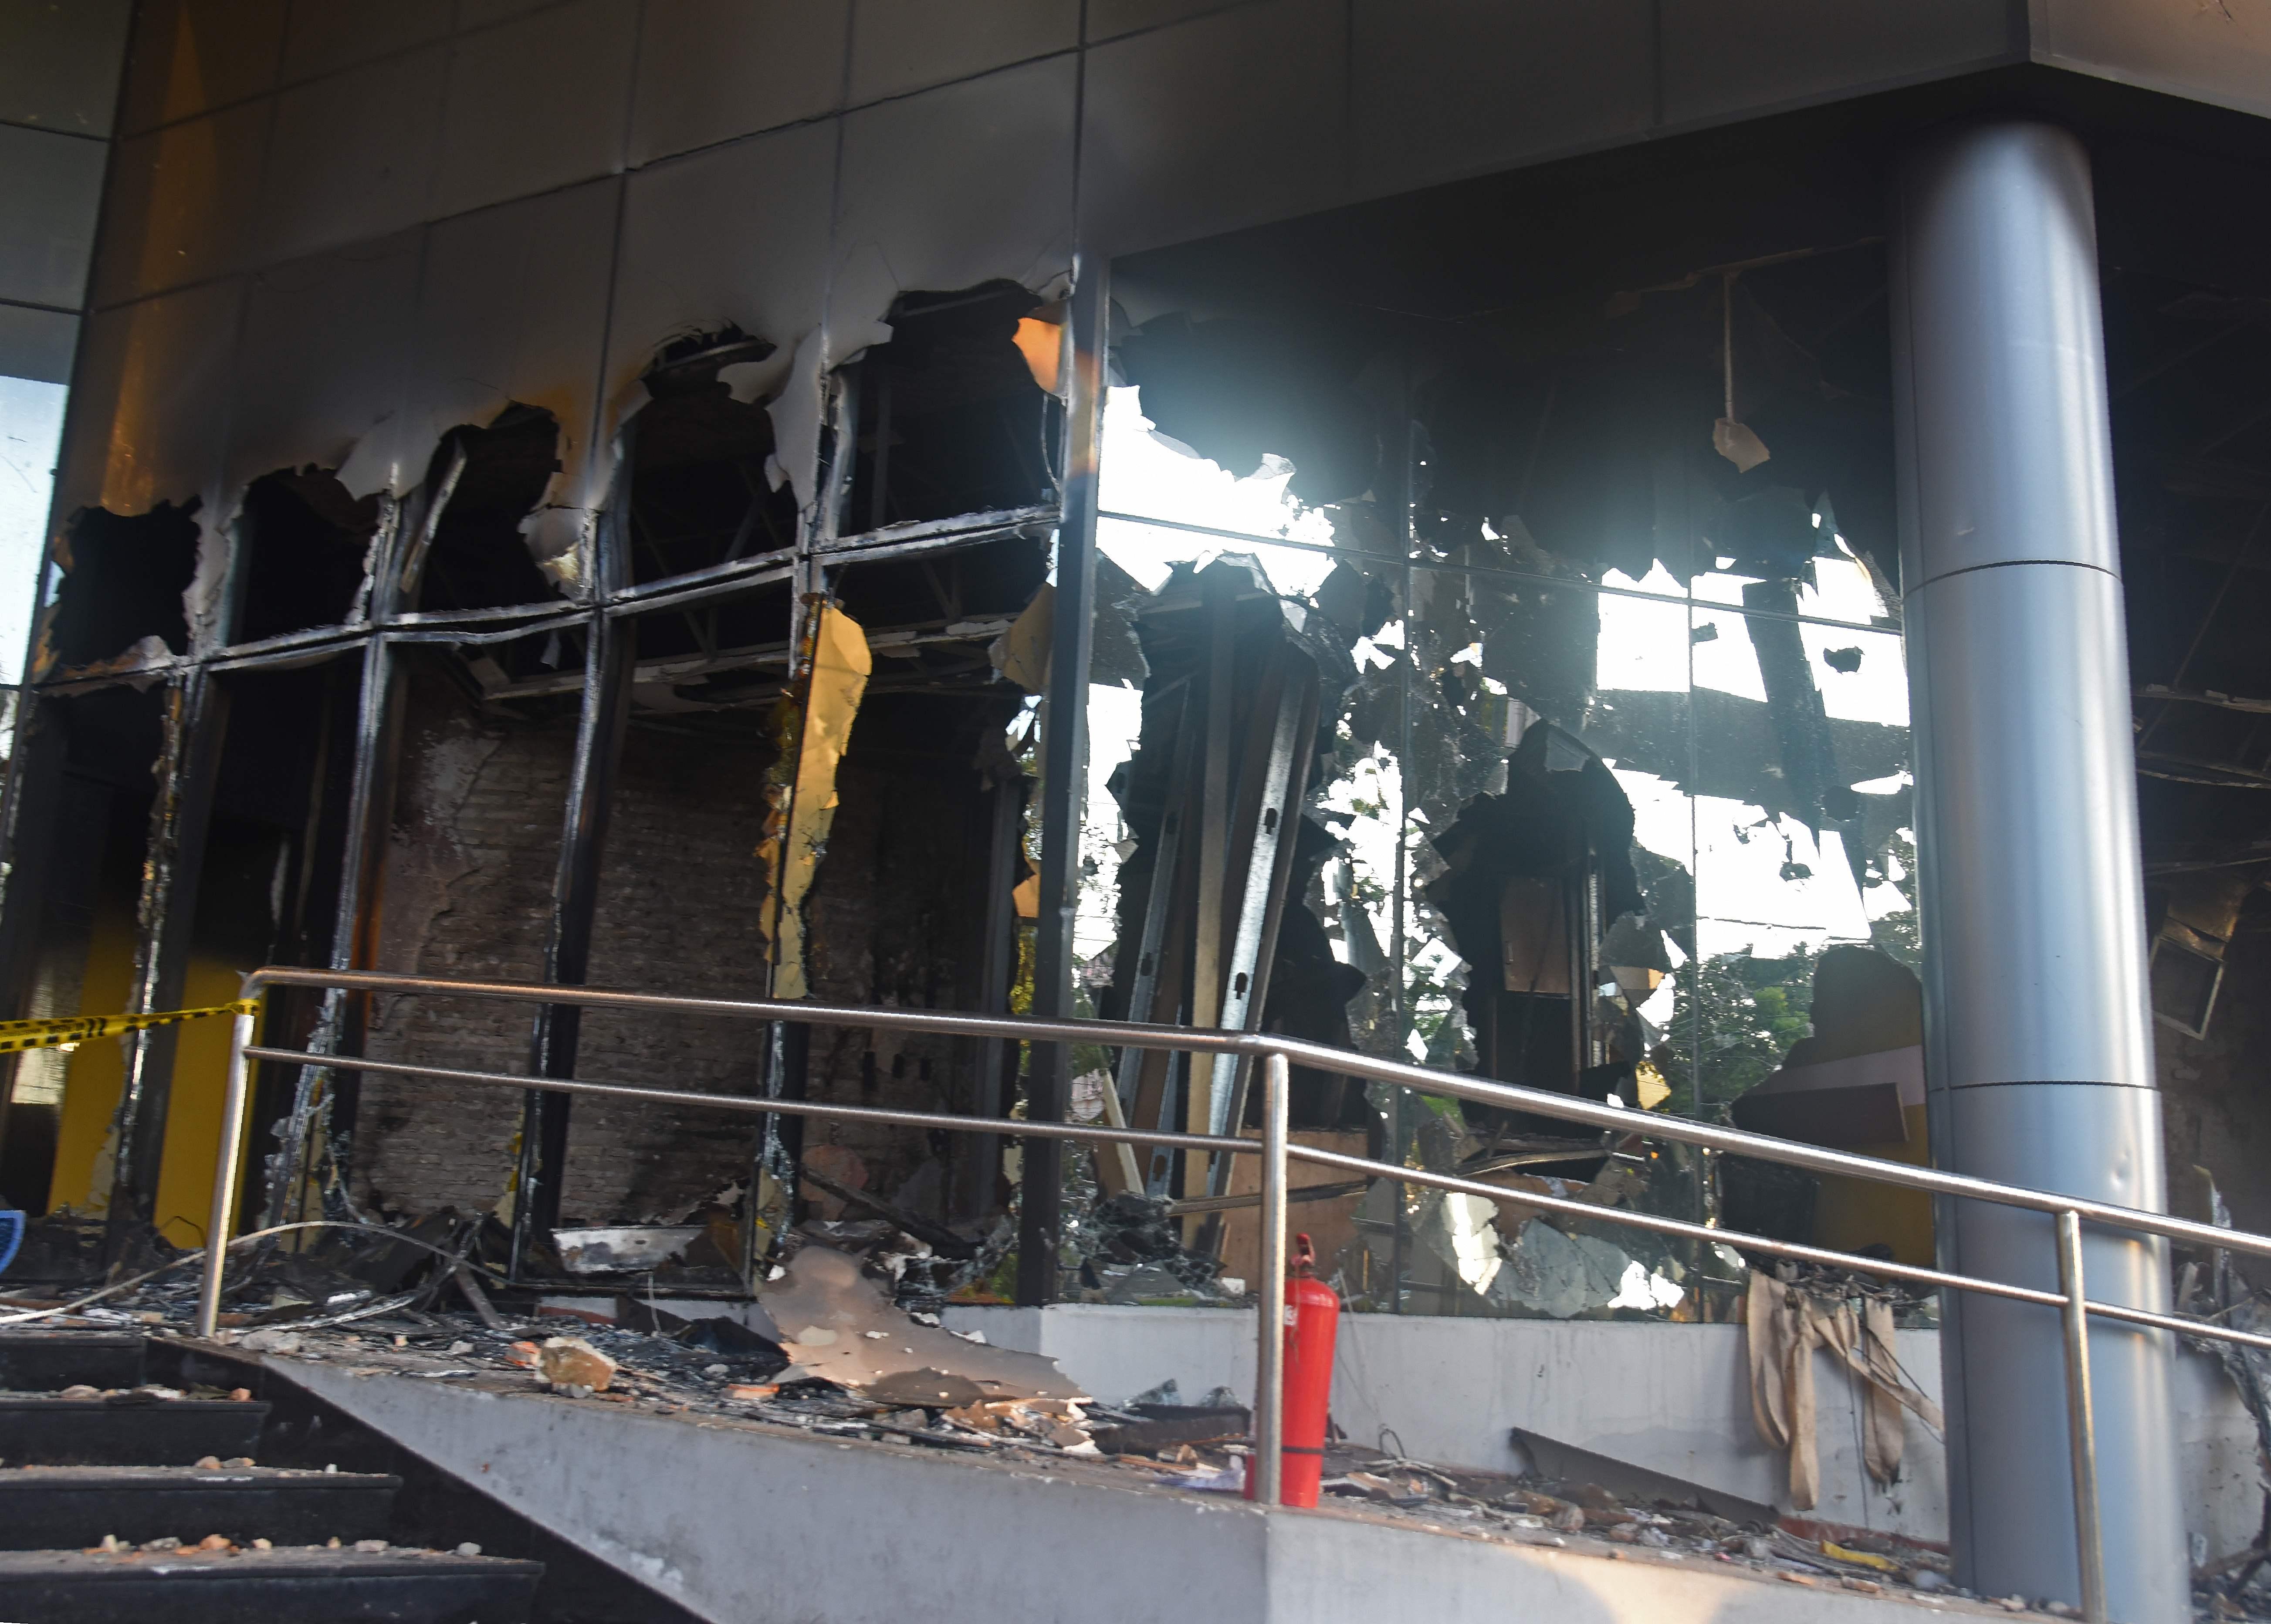 خسائر مادية بعد اندلاع مظاهرات باراجواى